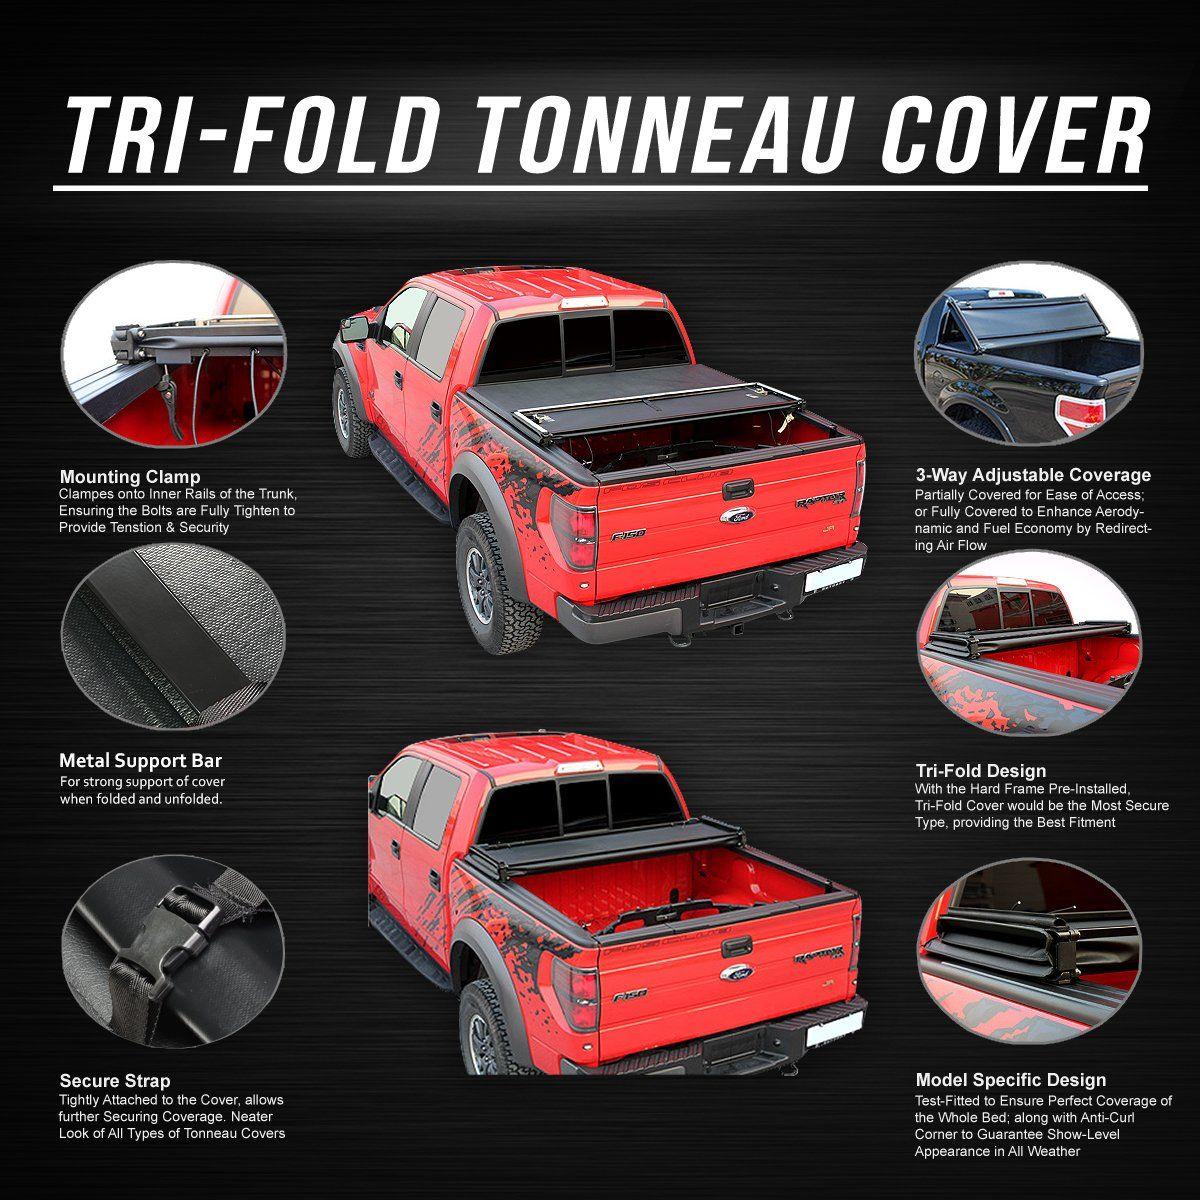 02 16 Dodge Ram 1500 2500 3500 8 Ft Bed Soft Folding Tri Fold Tonneau Cover In 2021 Tonneau Cover Tri Fold Tonneau Cover Truck Bed Covers